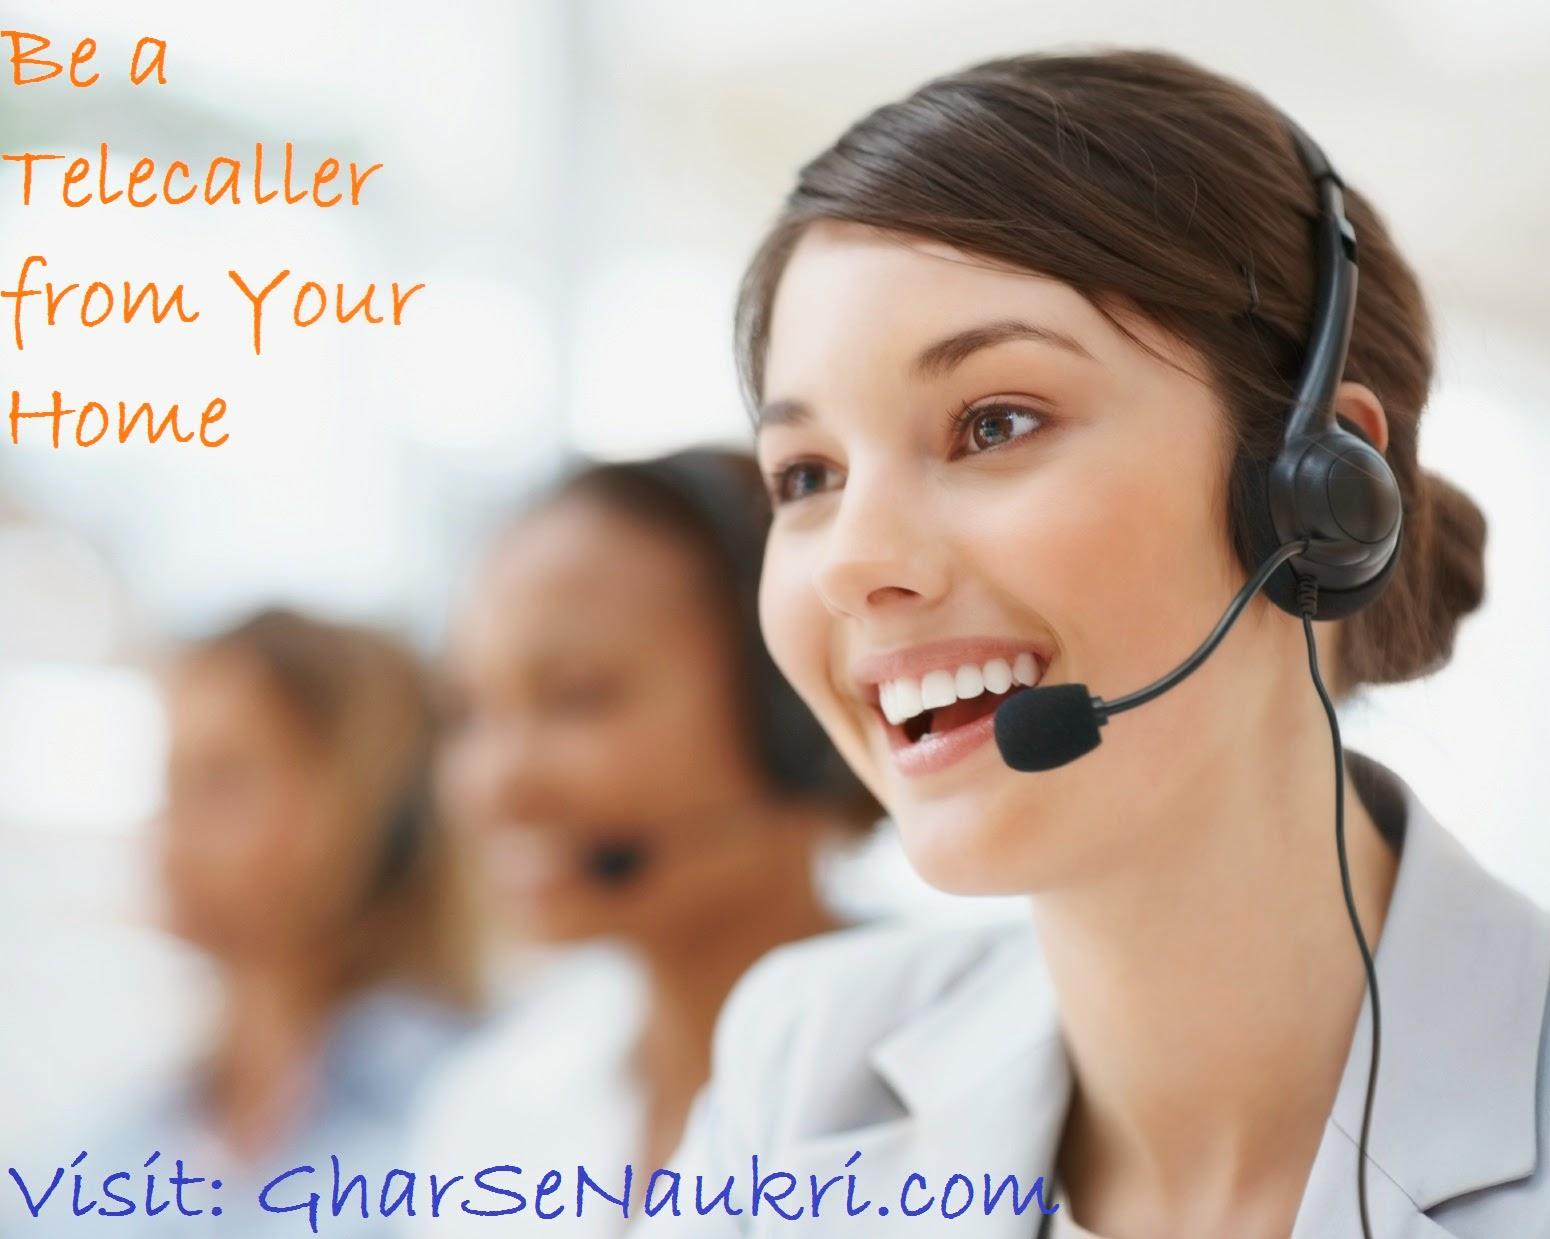 gharsenaukri work from home for women be a telecaller from your telecalling jobs for women from gharsenaukri